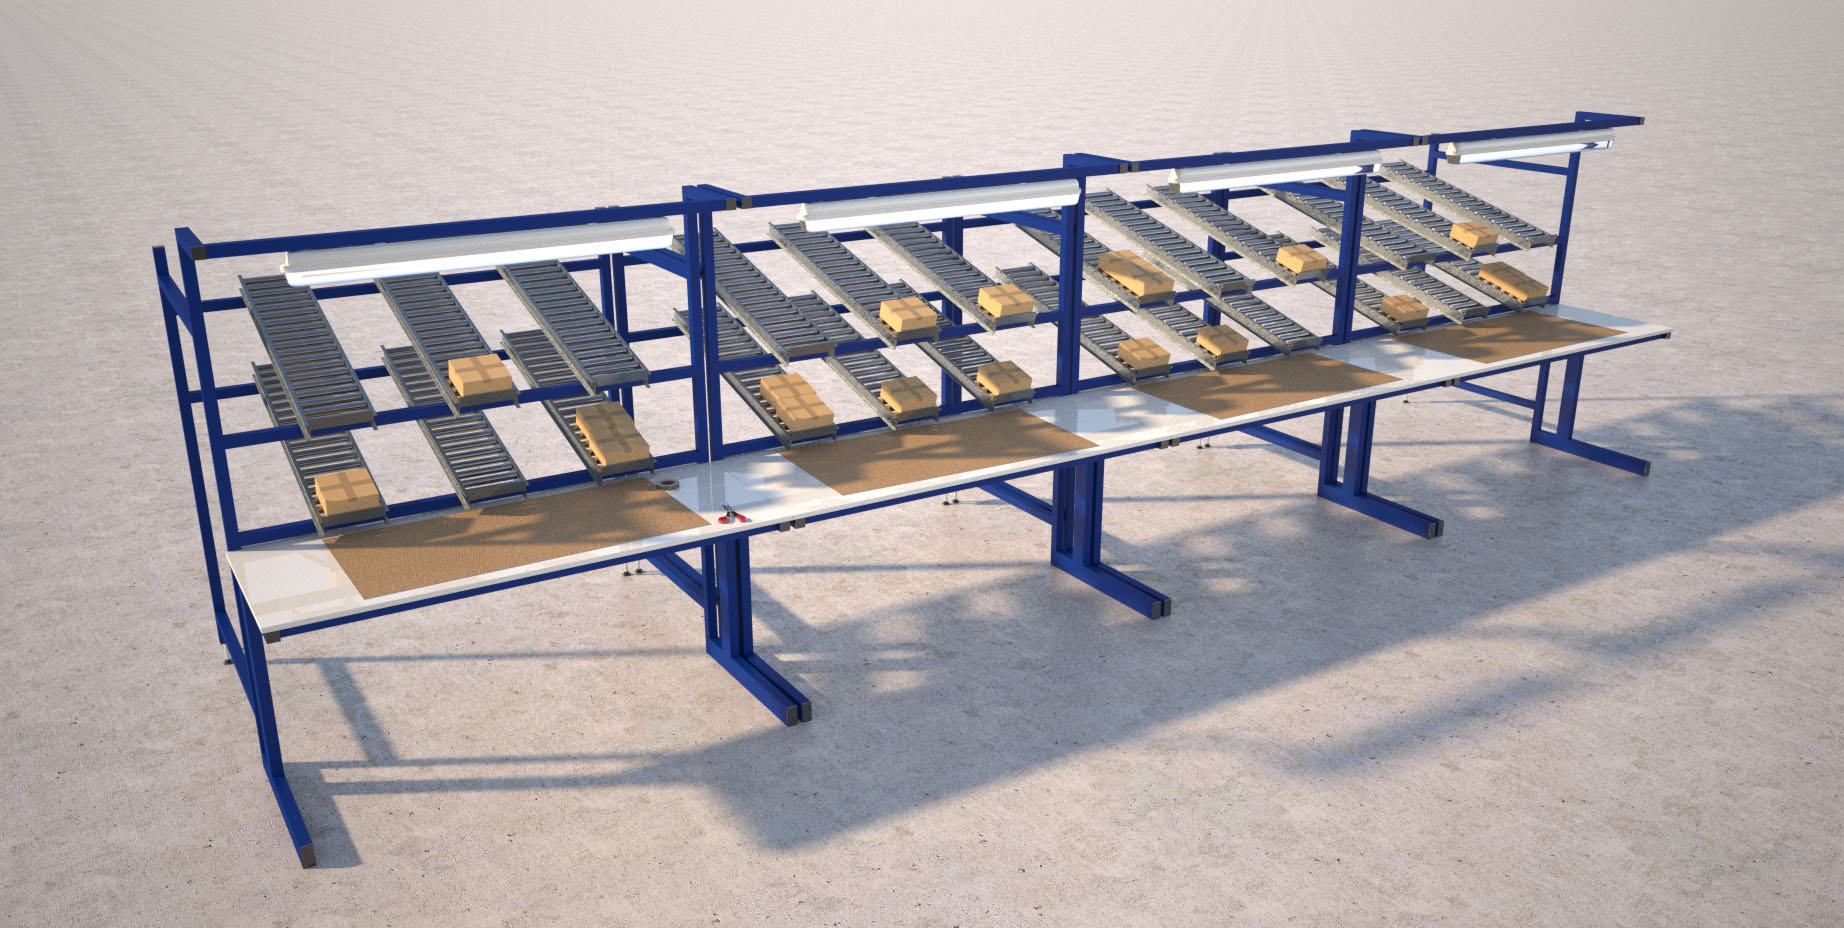 Industrial workbench with roller storage